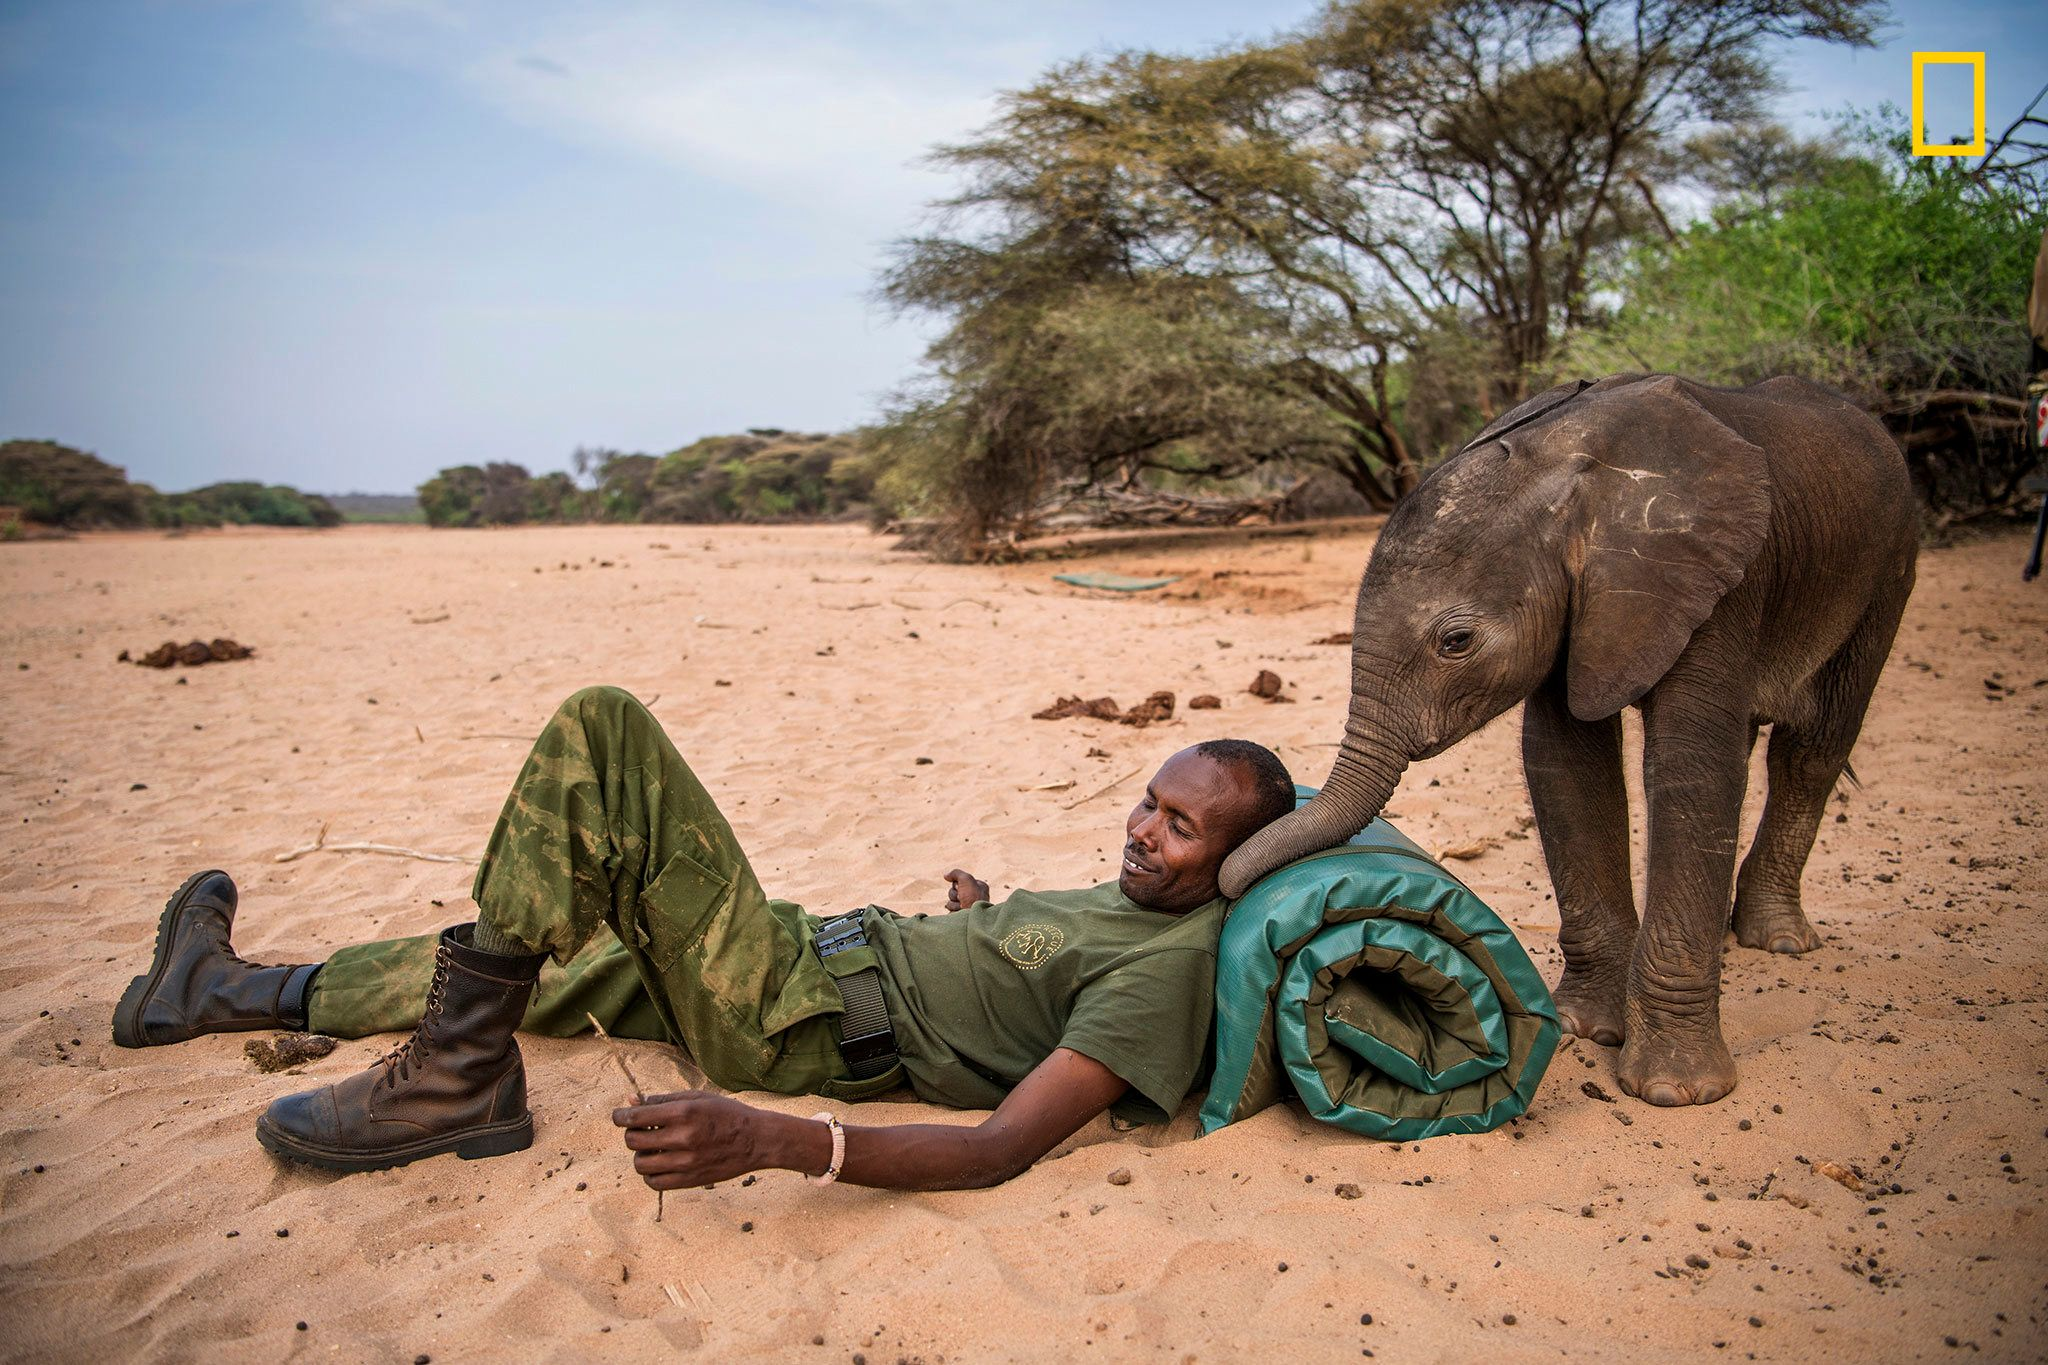 Locals have beenworking to save endangered baby elephants in northern Kenya.